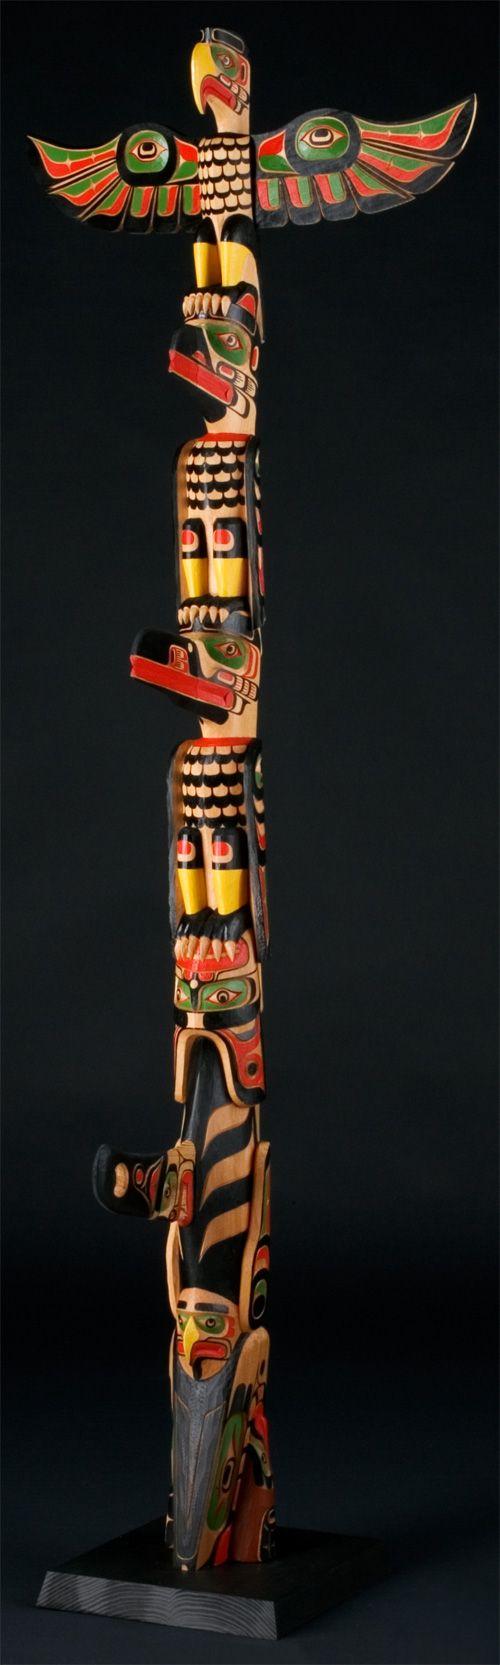 Eagle, Raven, Hok Hok, Killerwhale Totem Pole by Richard Hunt, Kwakwaka'wakw (Kwagiulth) artist